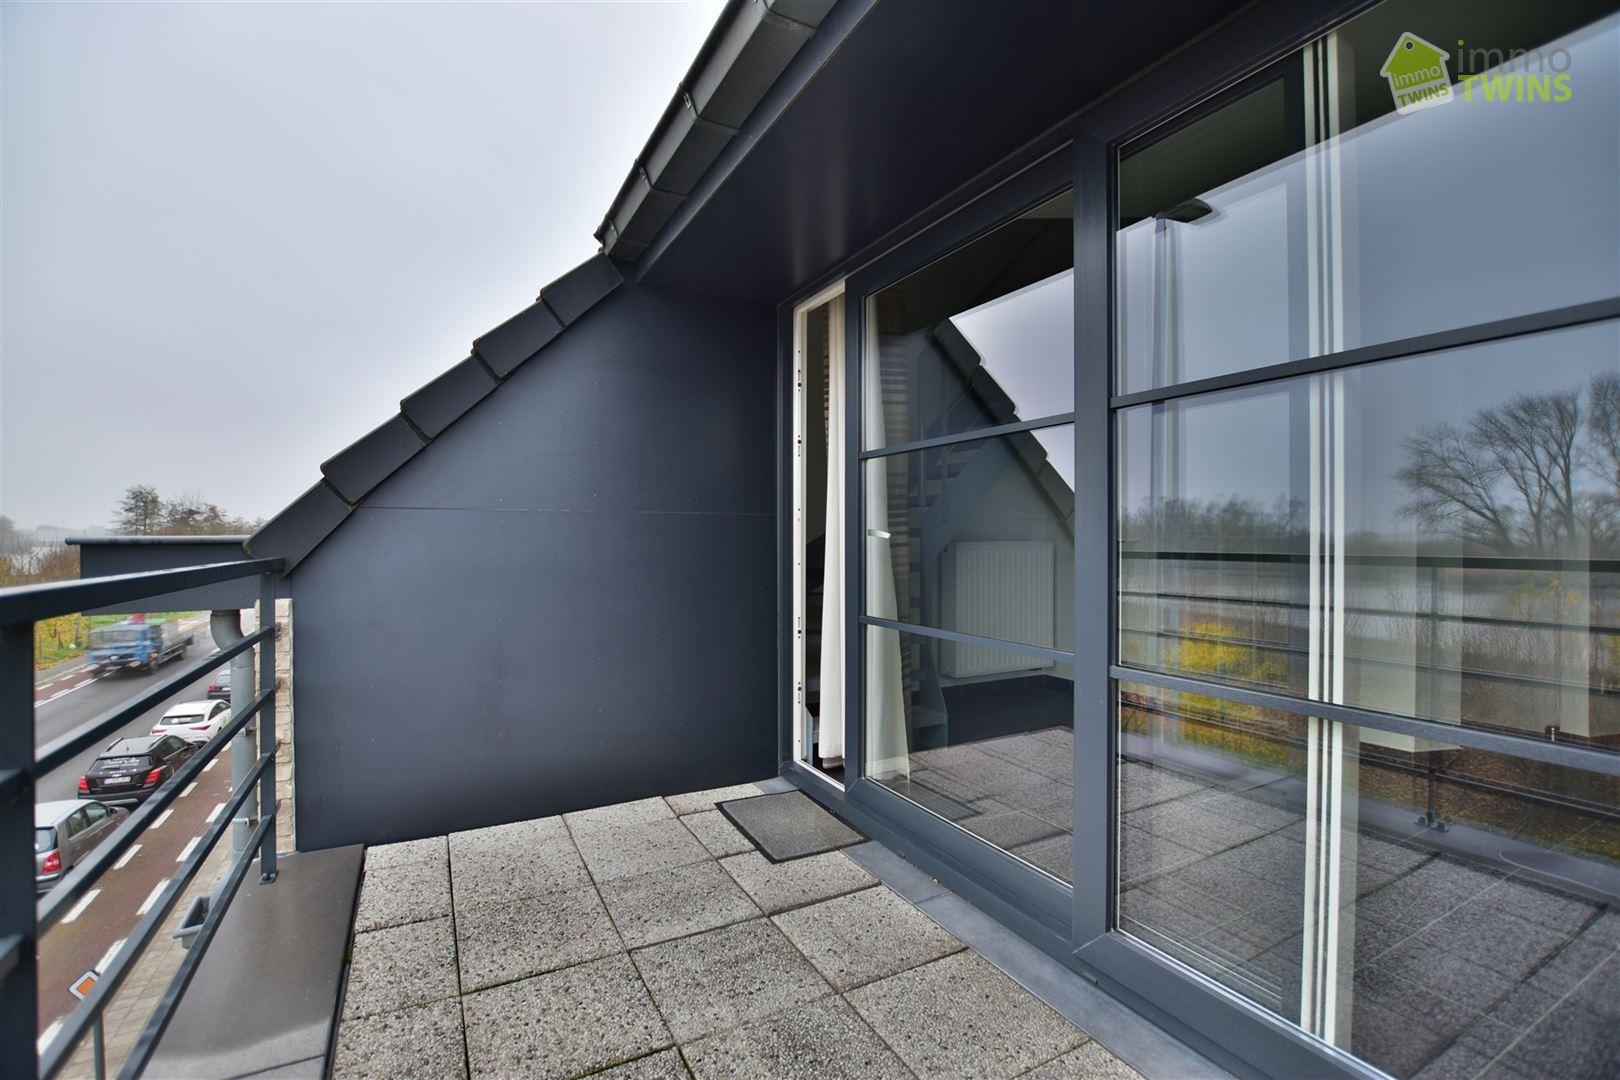 Foto 4 : Appartement te 9200 BAASRODE (België) - Prijs € 650